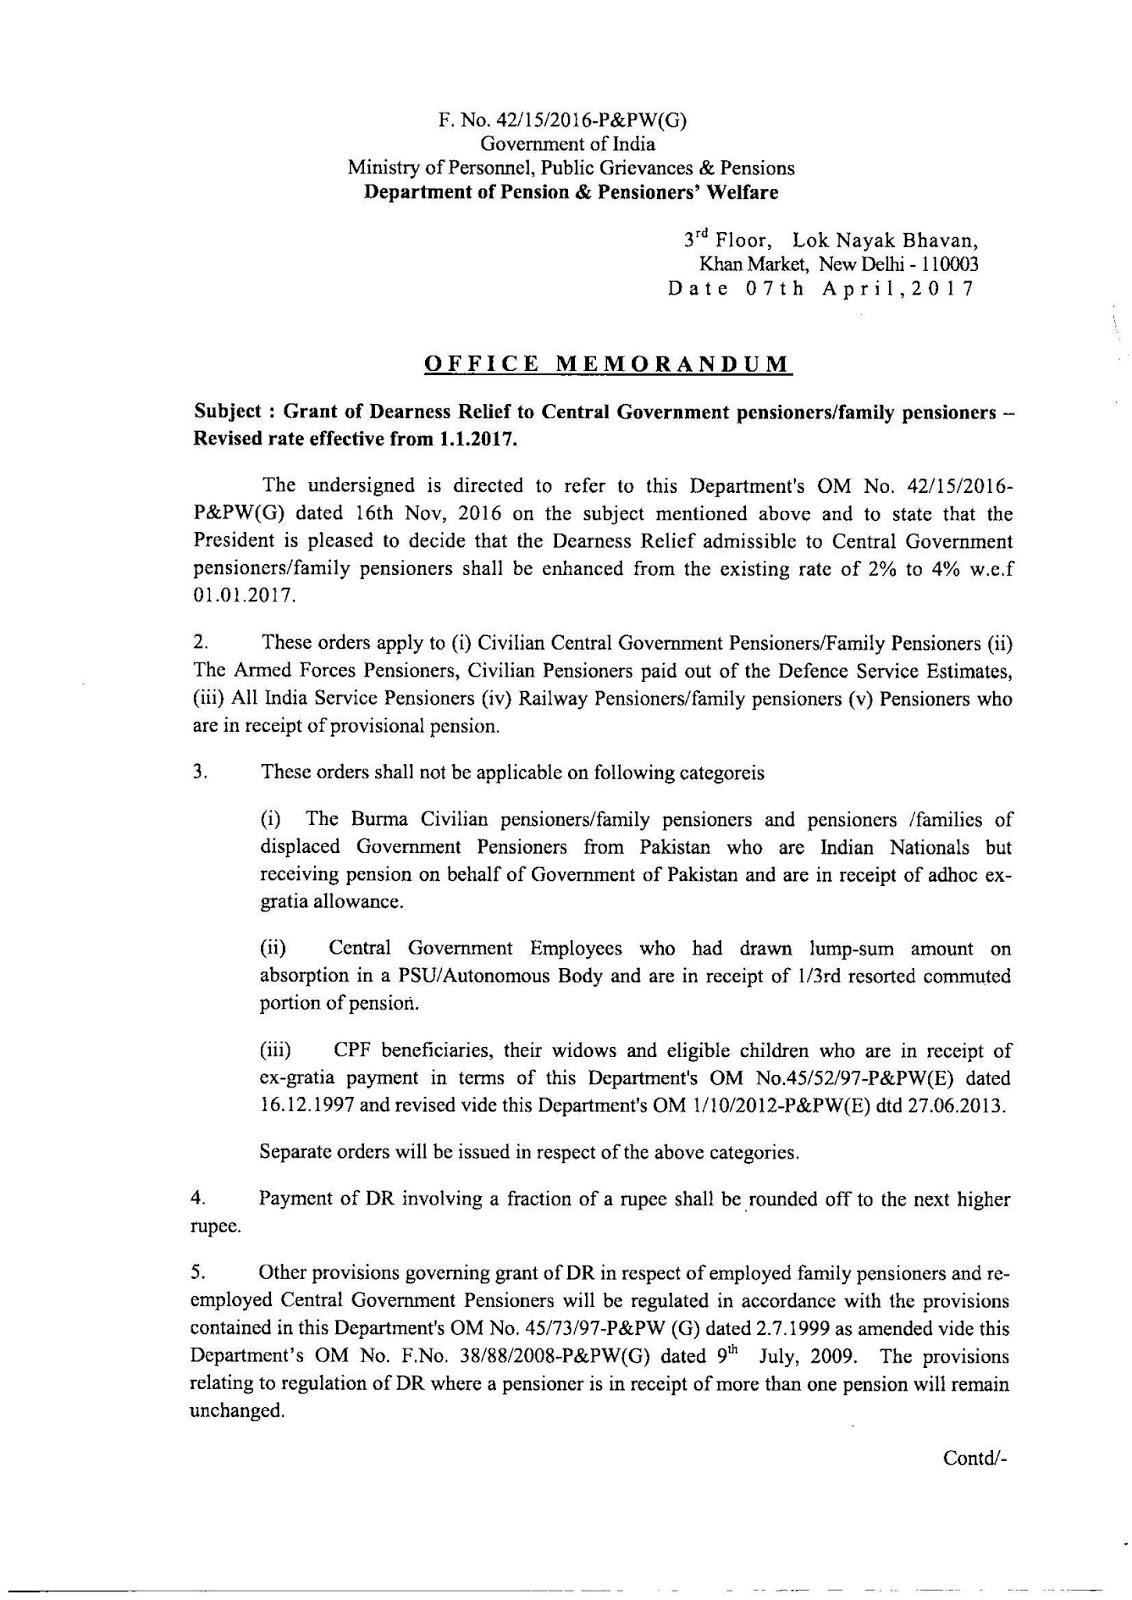 nationalised banks in india list 2017 pdf